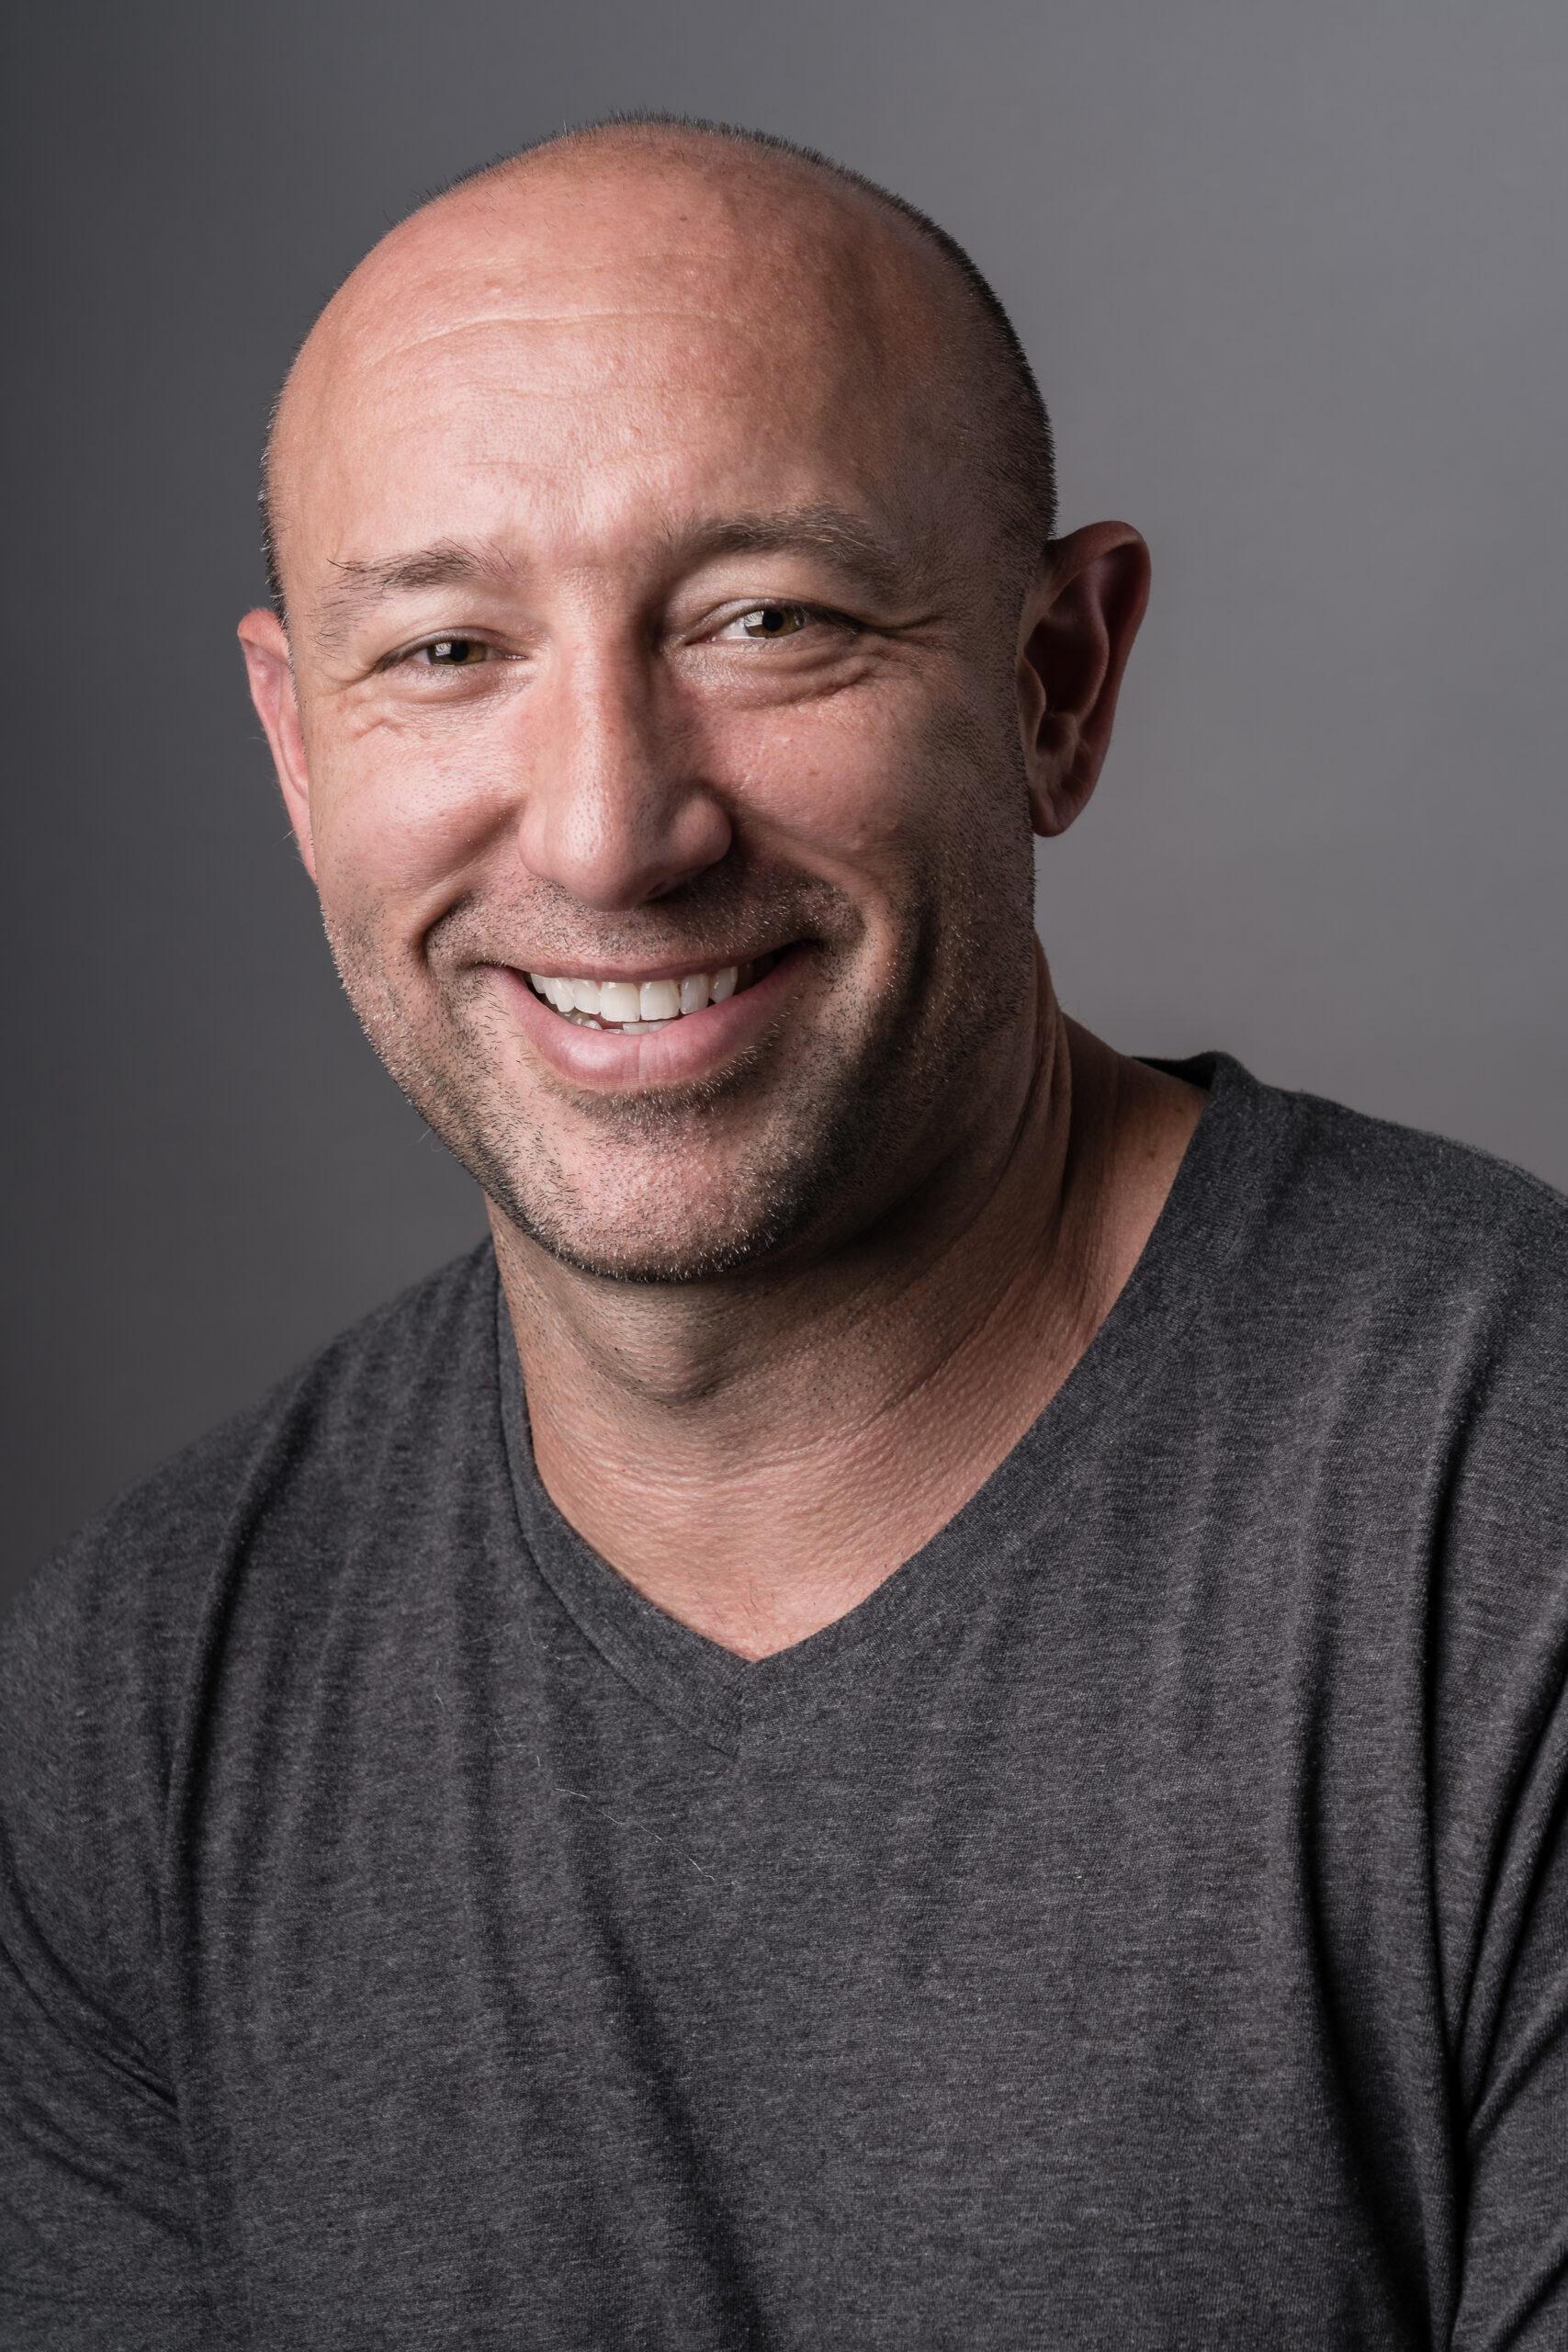 Dr. Todd Buzbee